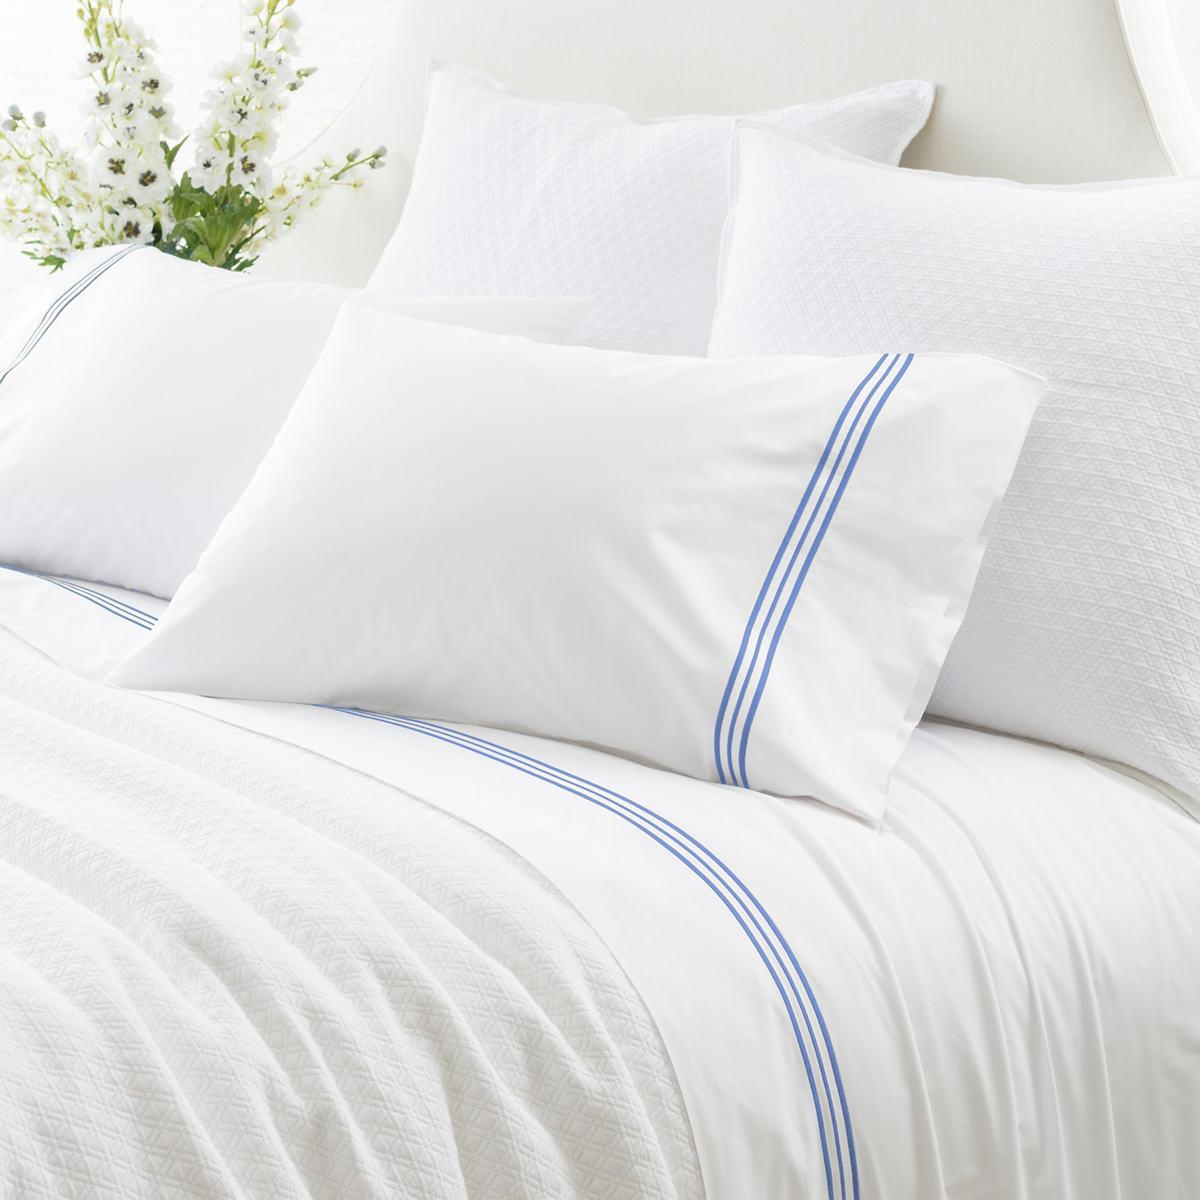 Trio French Blue Pillowcases (Pair)